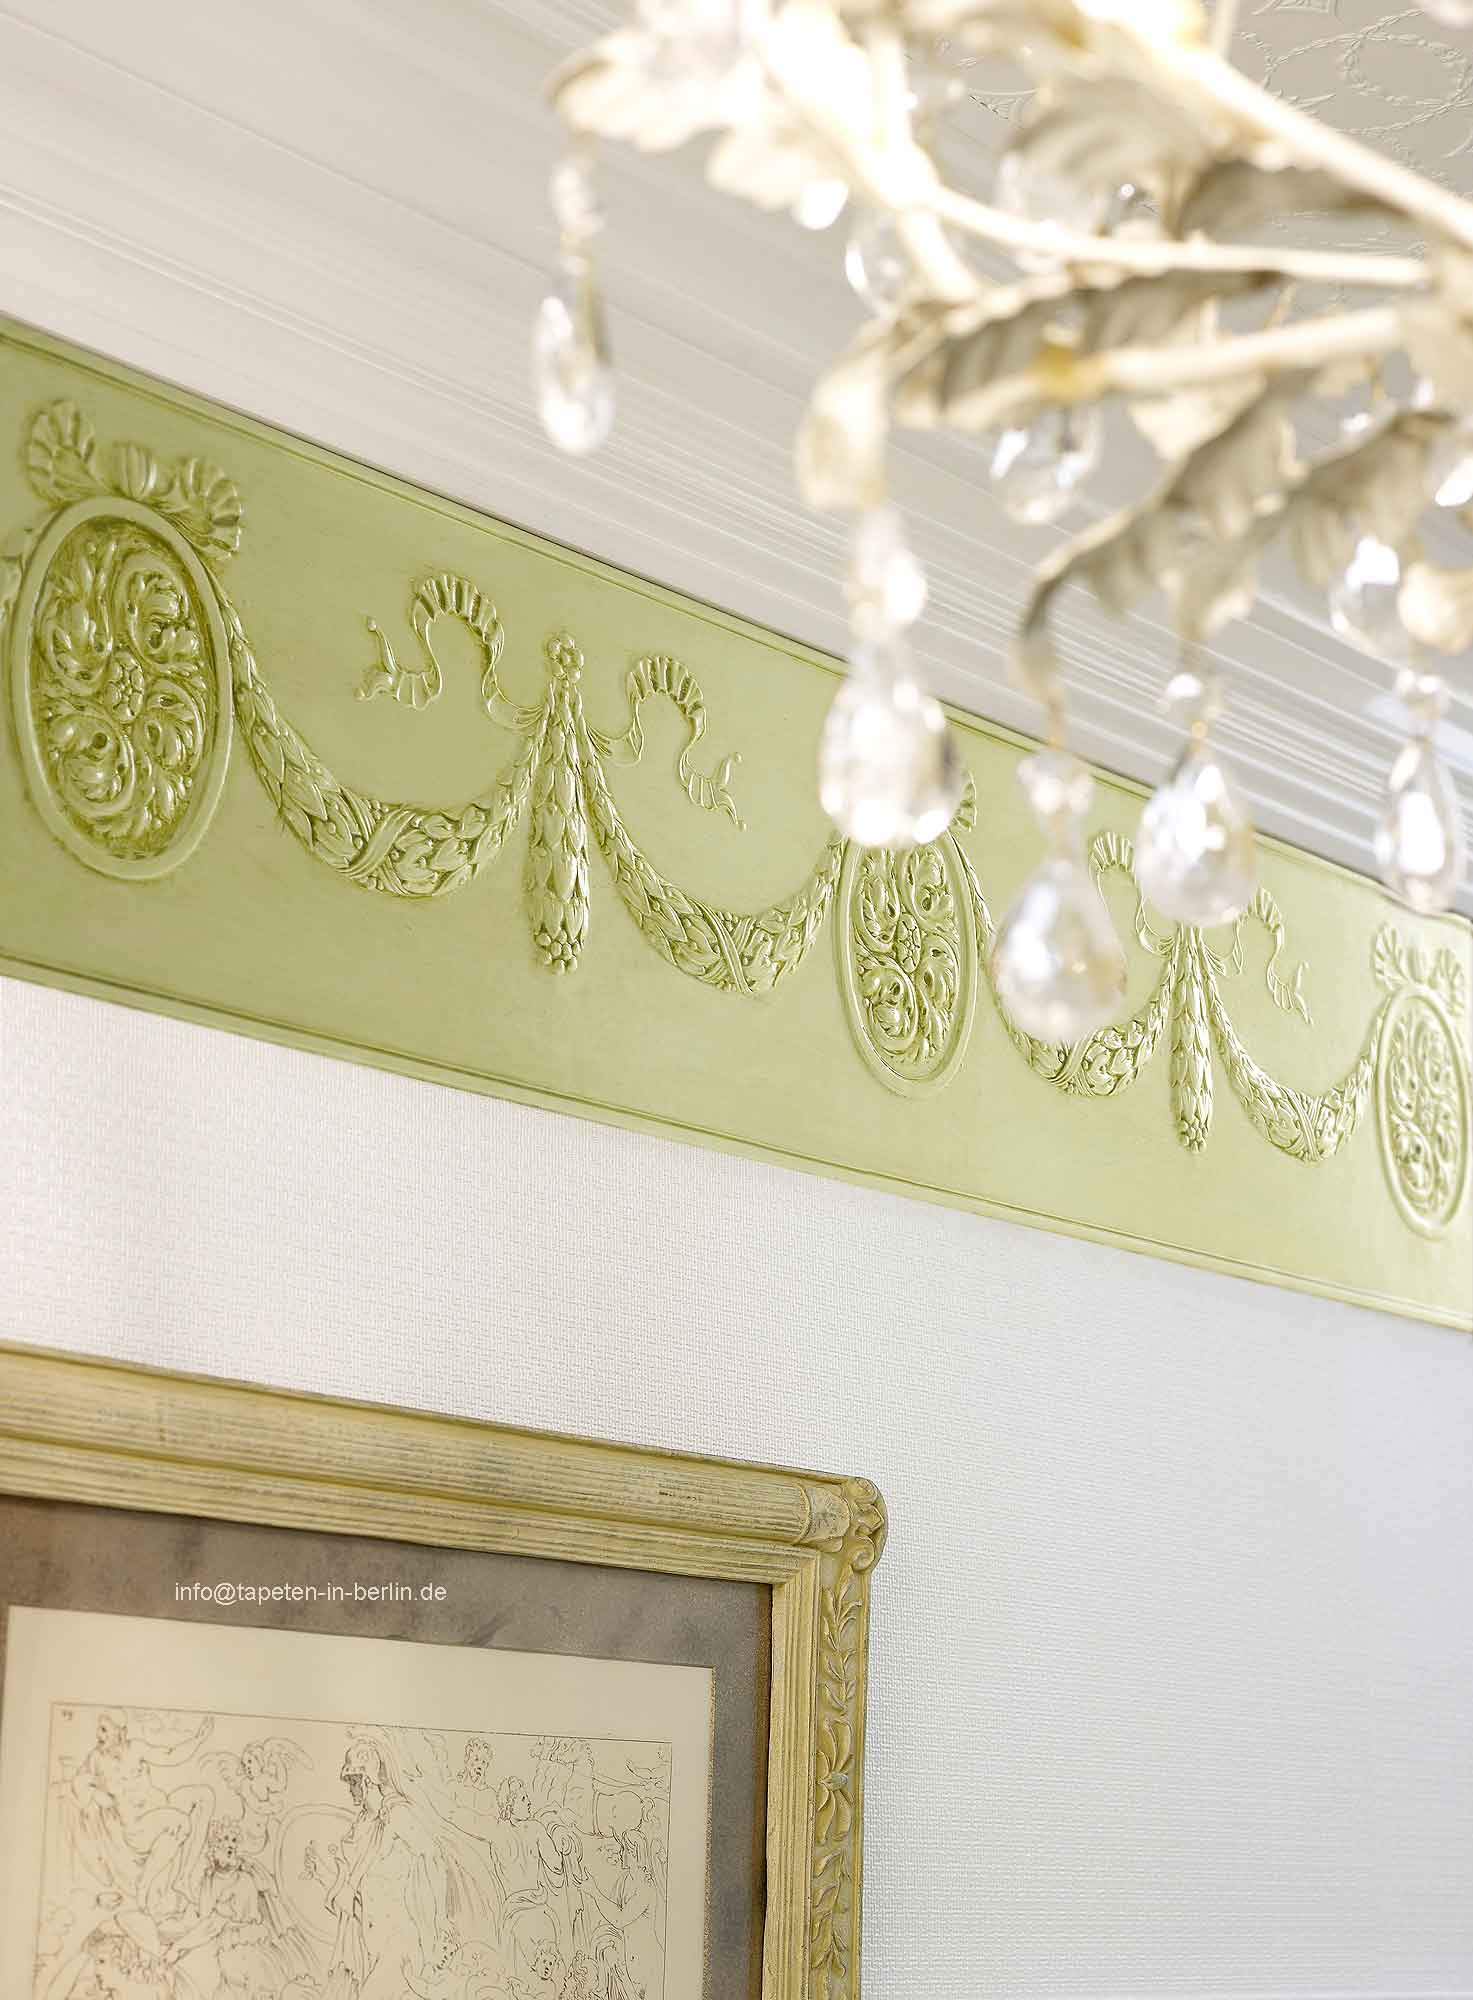 Lincrusta Tapete images of wallpaper borders uk related fan